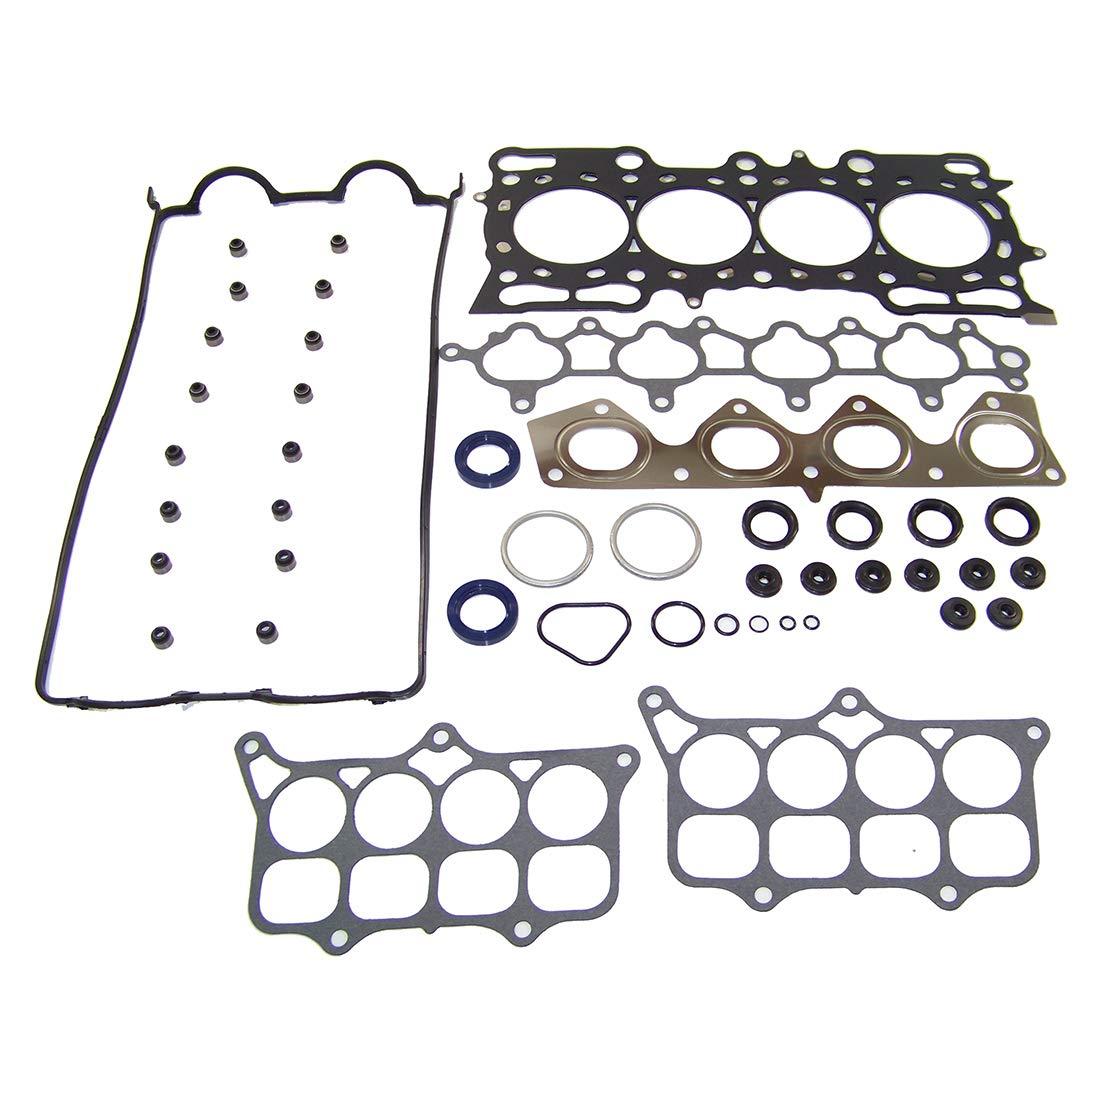 DNJ HGS224 Head Gasket Set 1997-2001 for Honda//Prelude//2.2L//DOHC//L4//16V//2156cc//H22A4